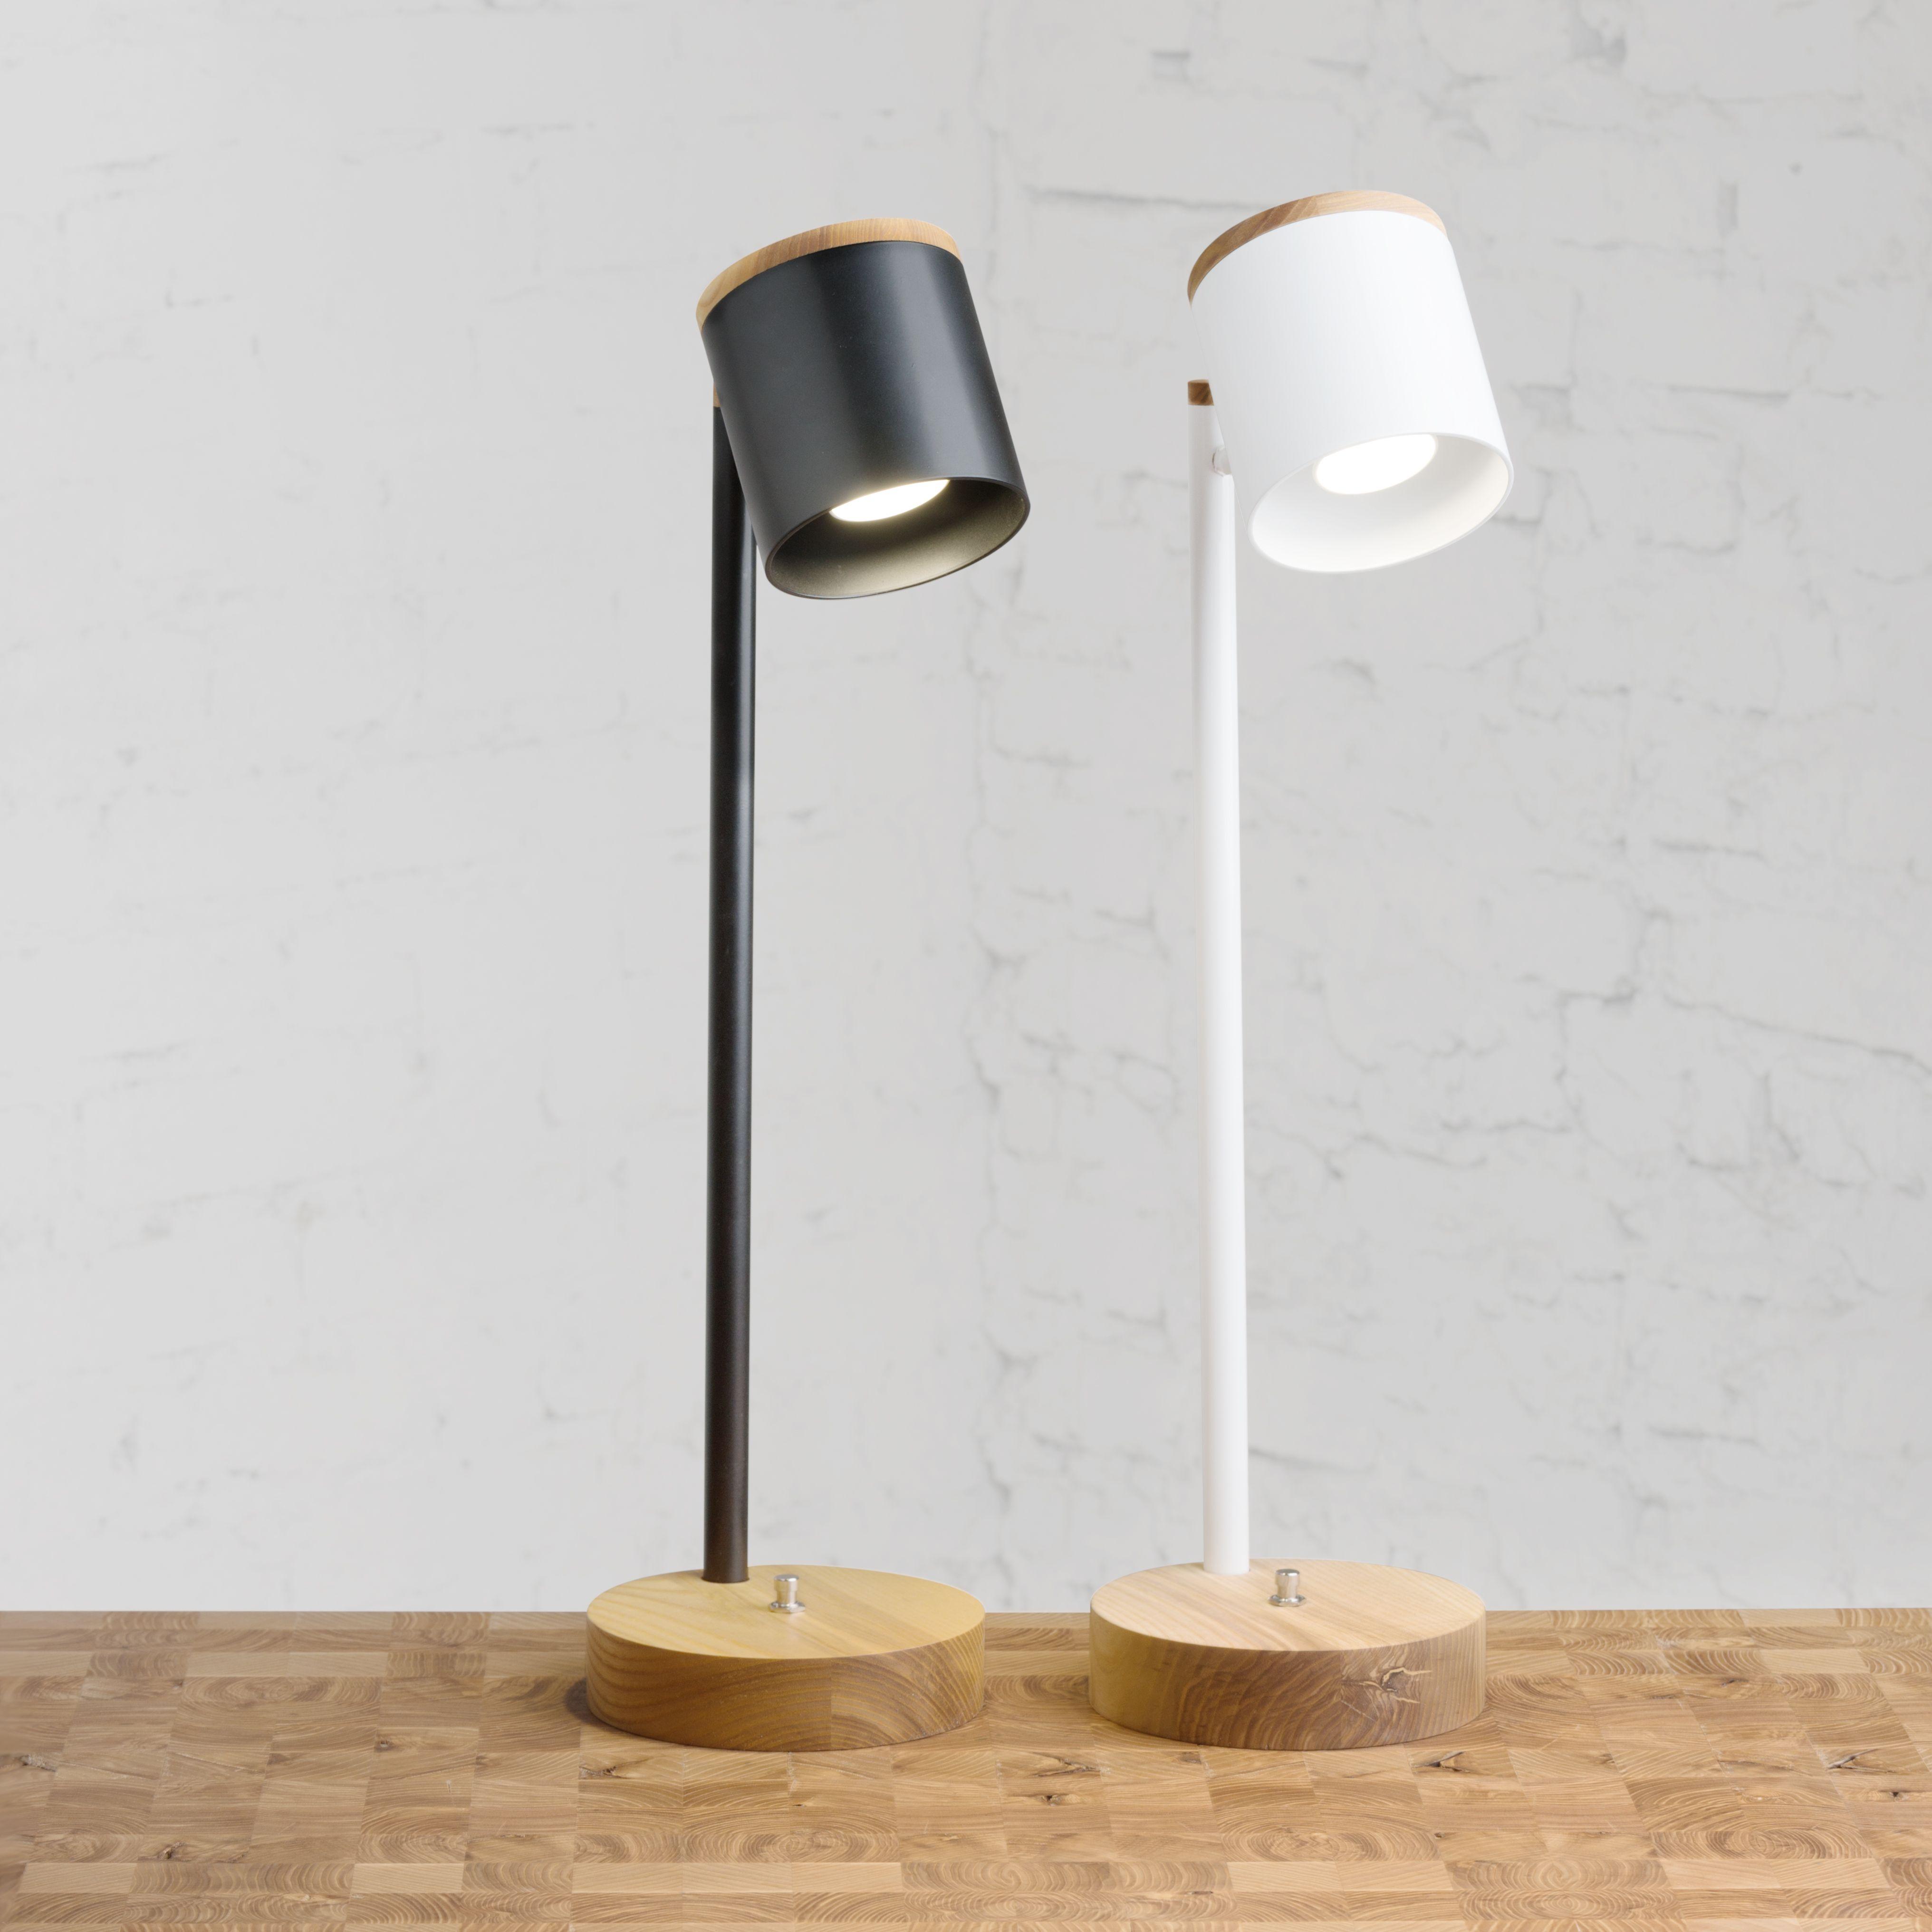 Table Lamp Urban Table Lamps Lamp Shades Lighting Lamp Bedroom Lamps Living Room Lamps Modern Lamps Modern Table Lamps Read Desk Lamp Lamp Table Lamp #reading #lamps #living #room